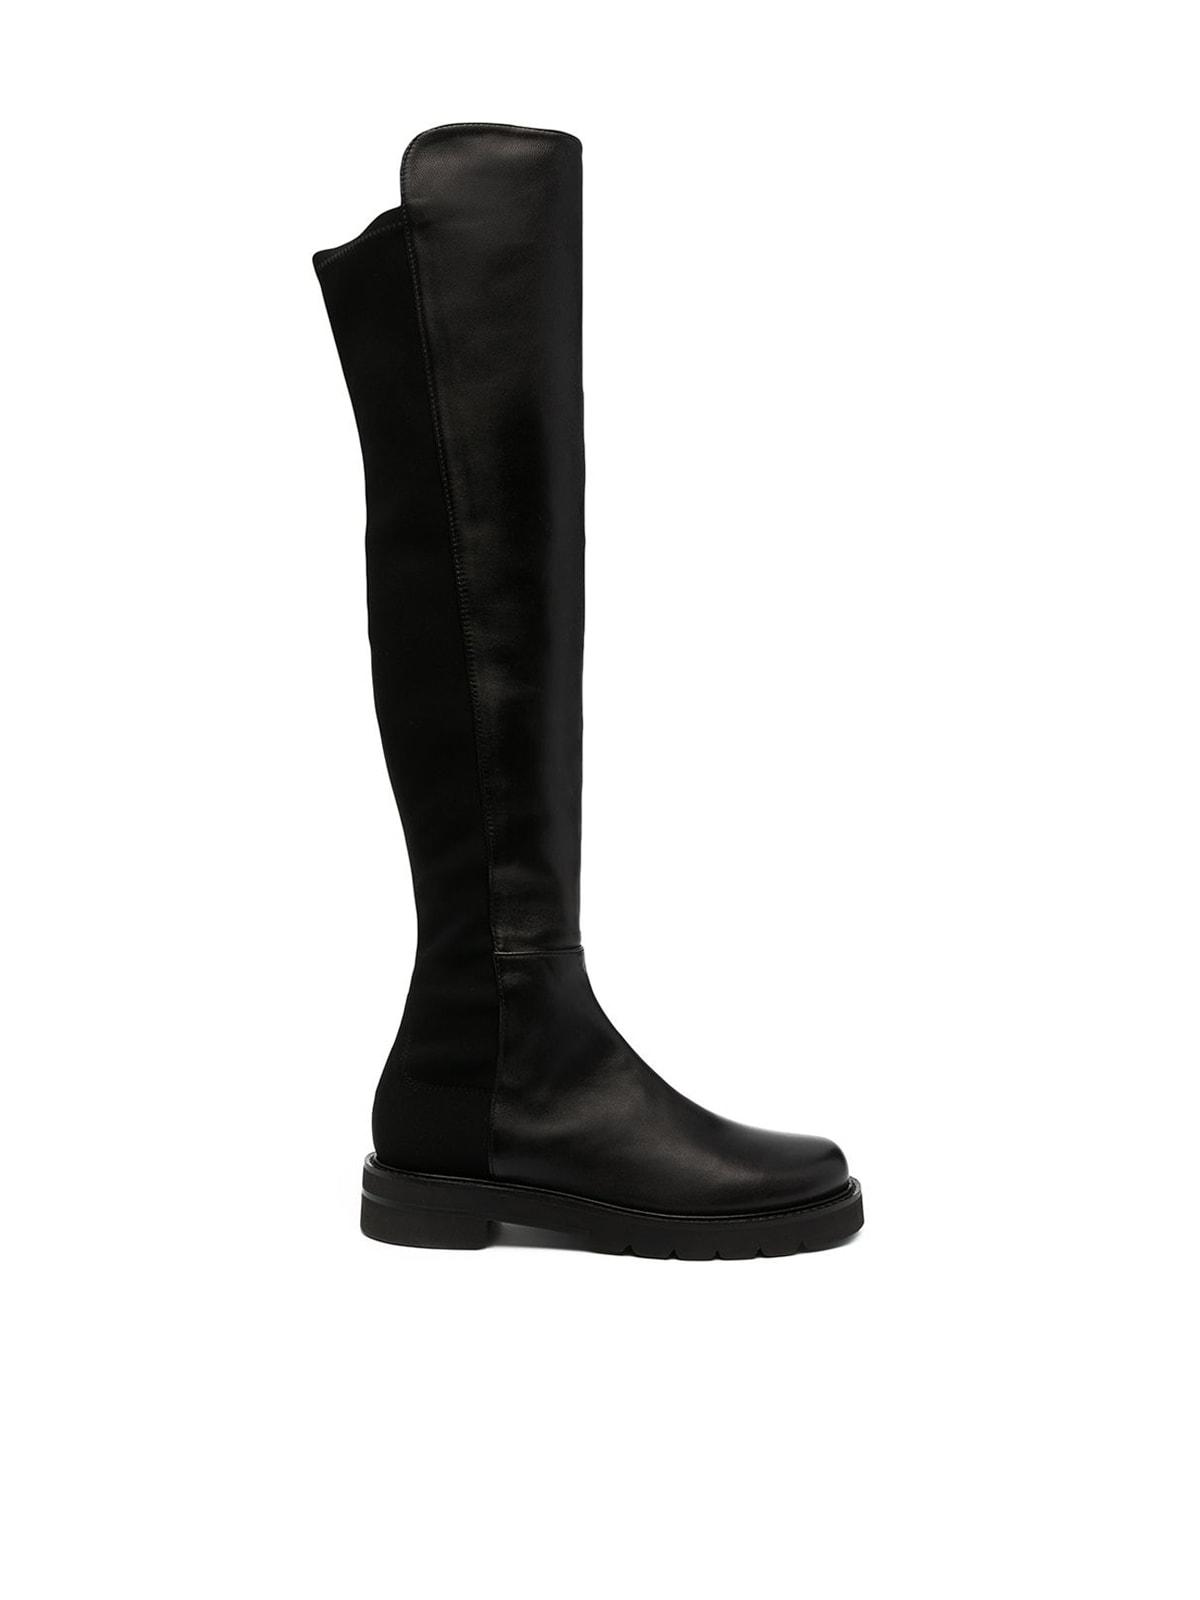 Buy Stuart Weitzman 5050 Lift online, shop Stuart Weitzman shoes with free shipping